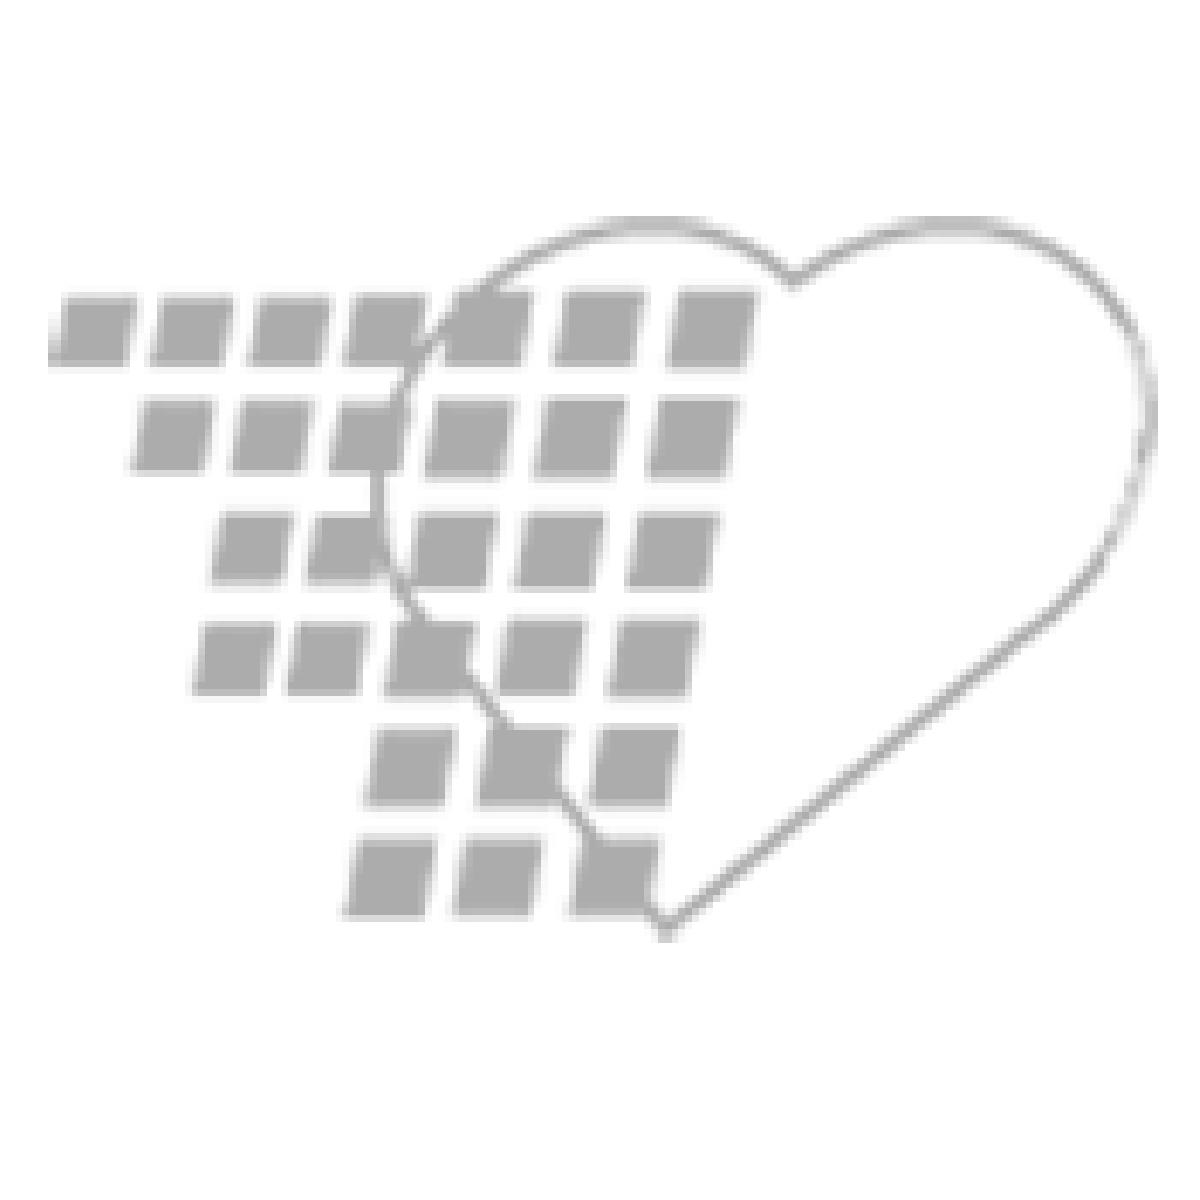 06-93-6107 Demo Dose® Simulated FFP A Rh Positive